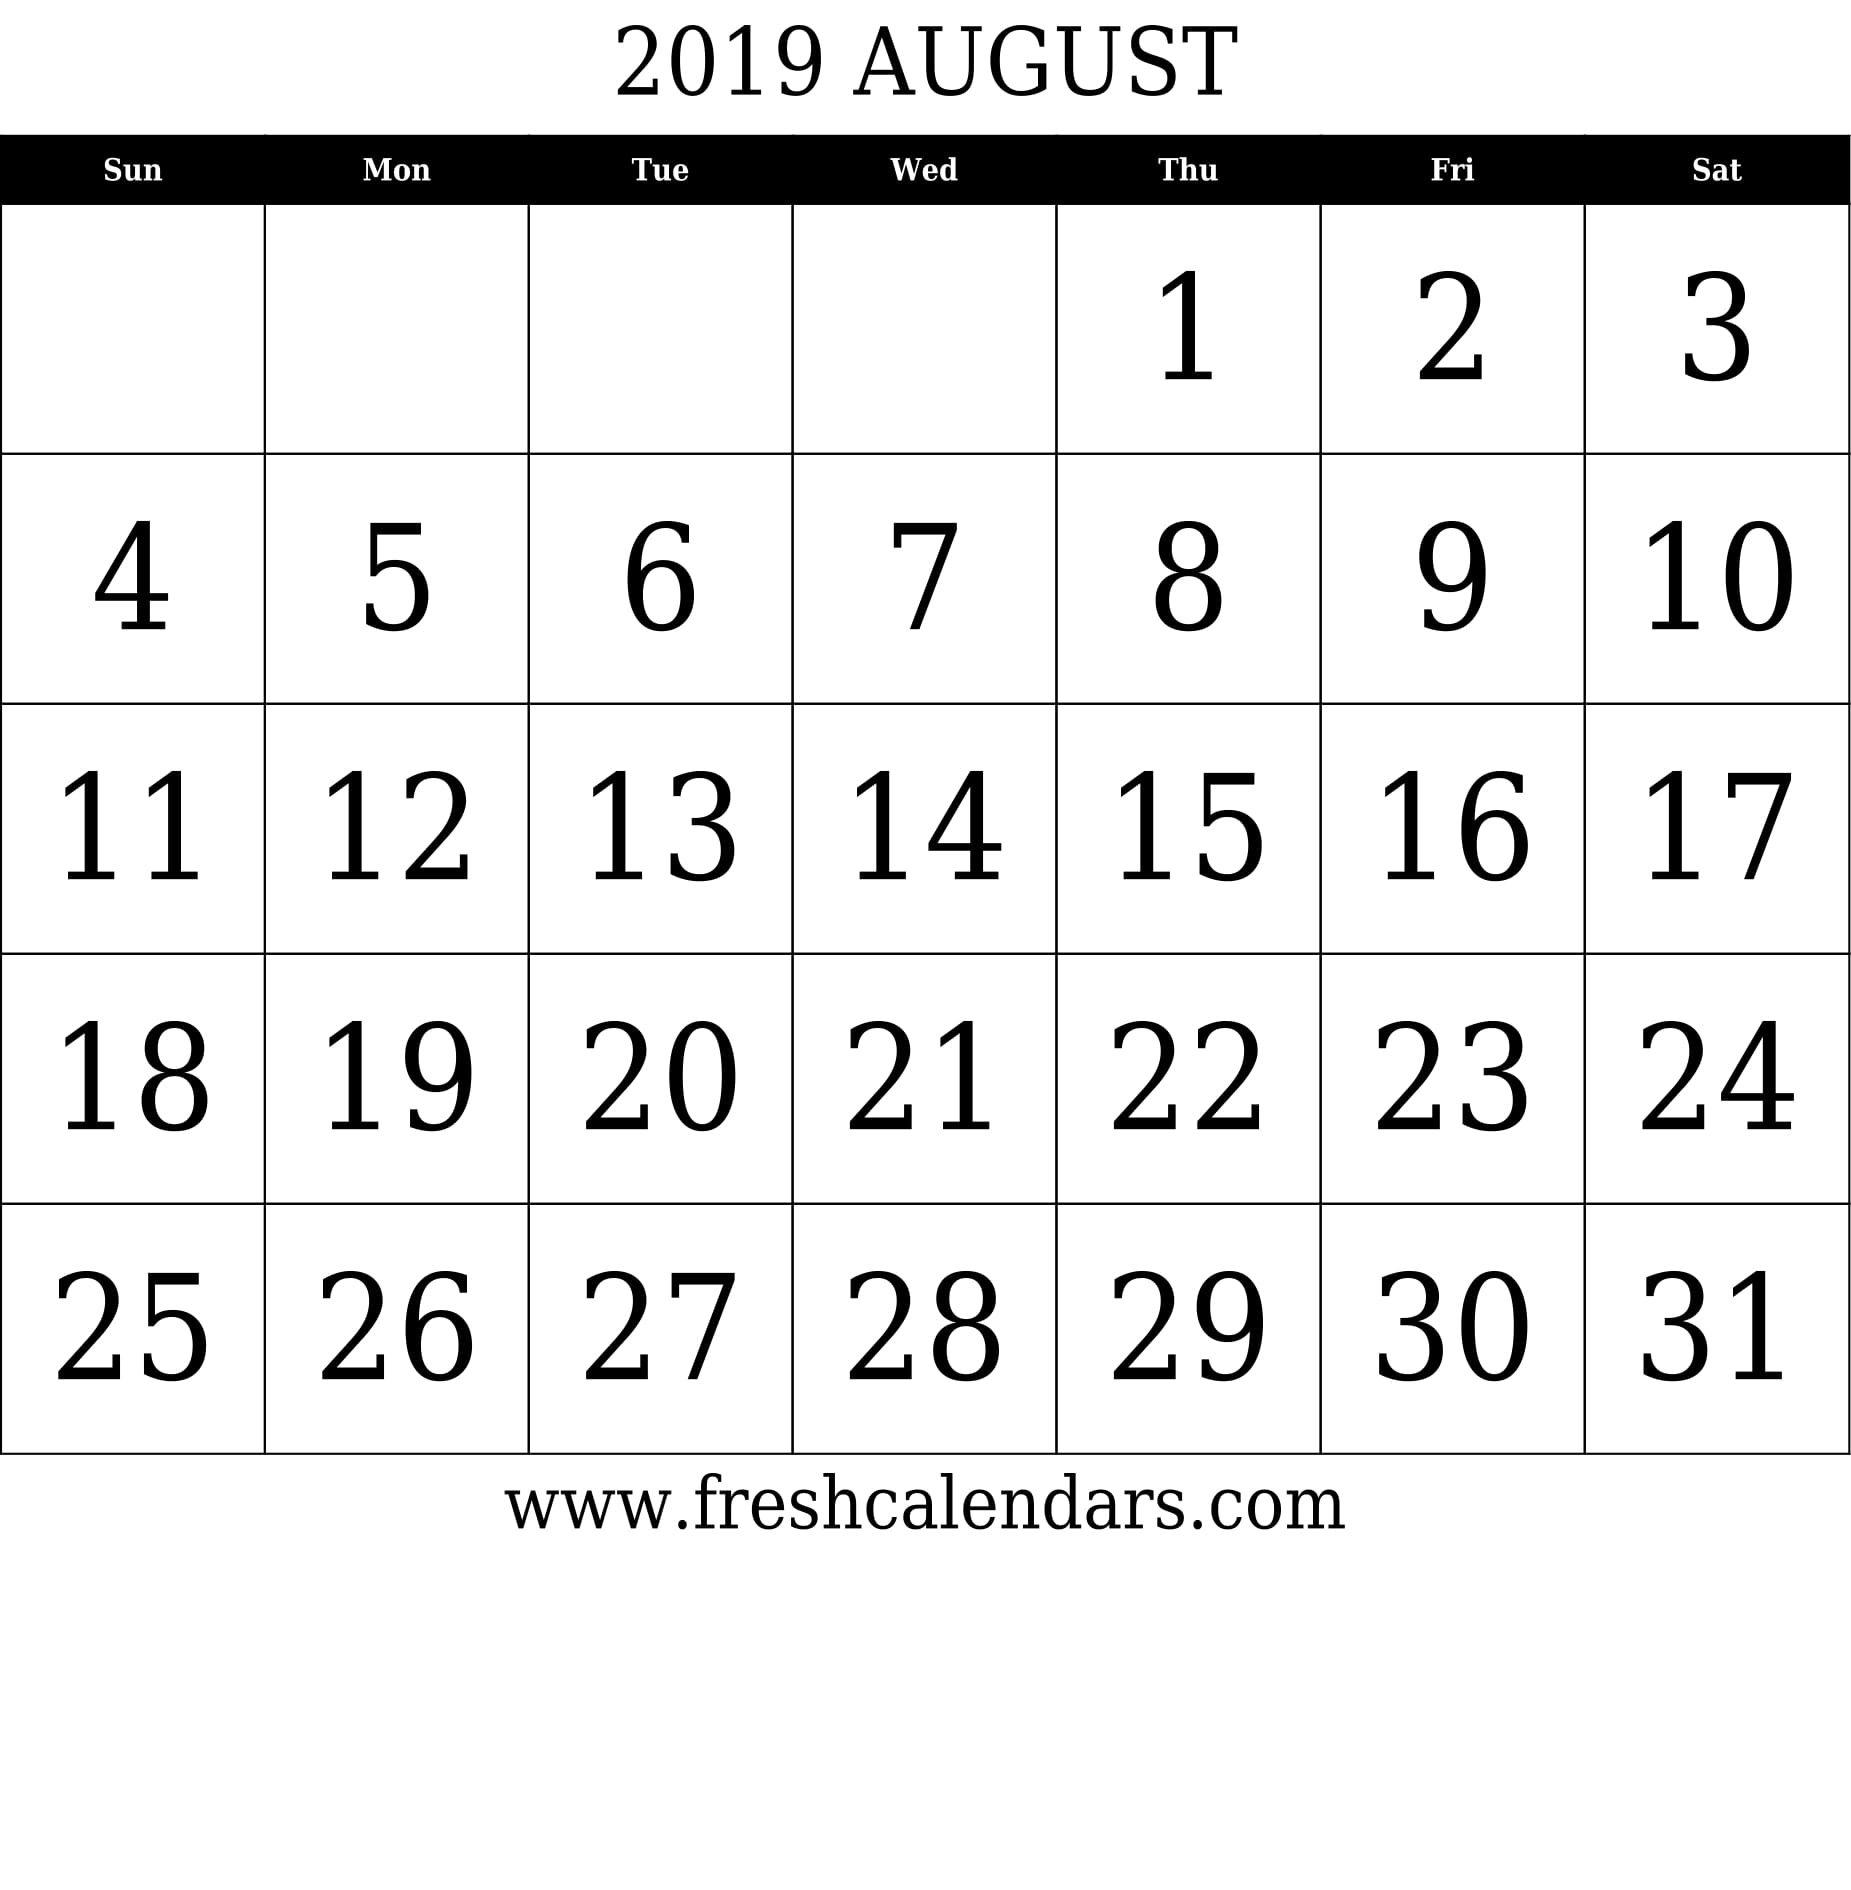 August 2019 Printable Calendars - Fresh Calendars 8 August 2019 Calendar